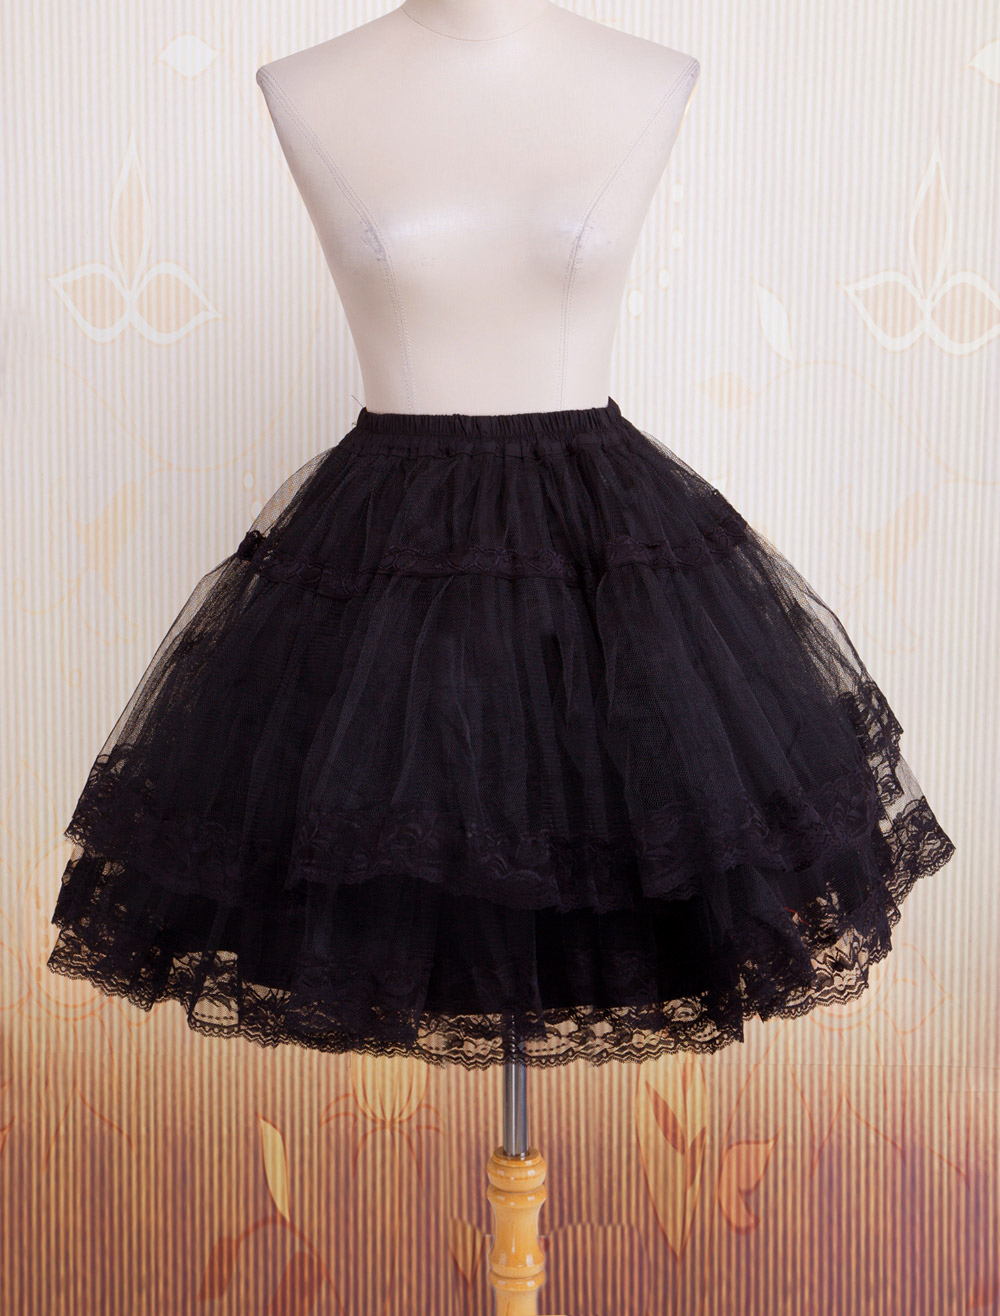 Bell Shape Black Organza Lolita Petticoat Lace Trim